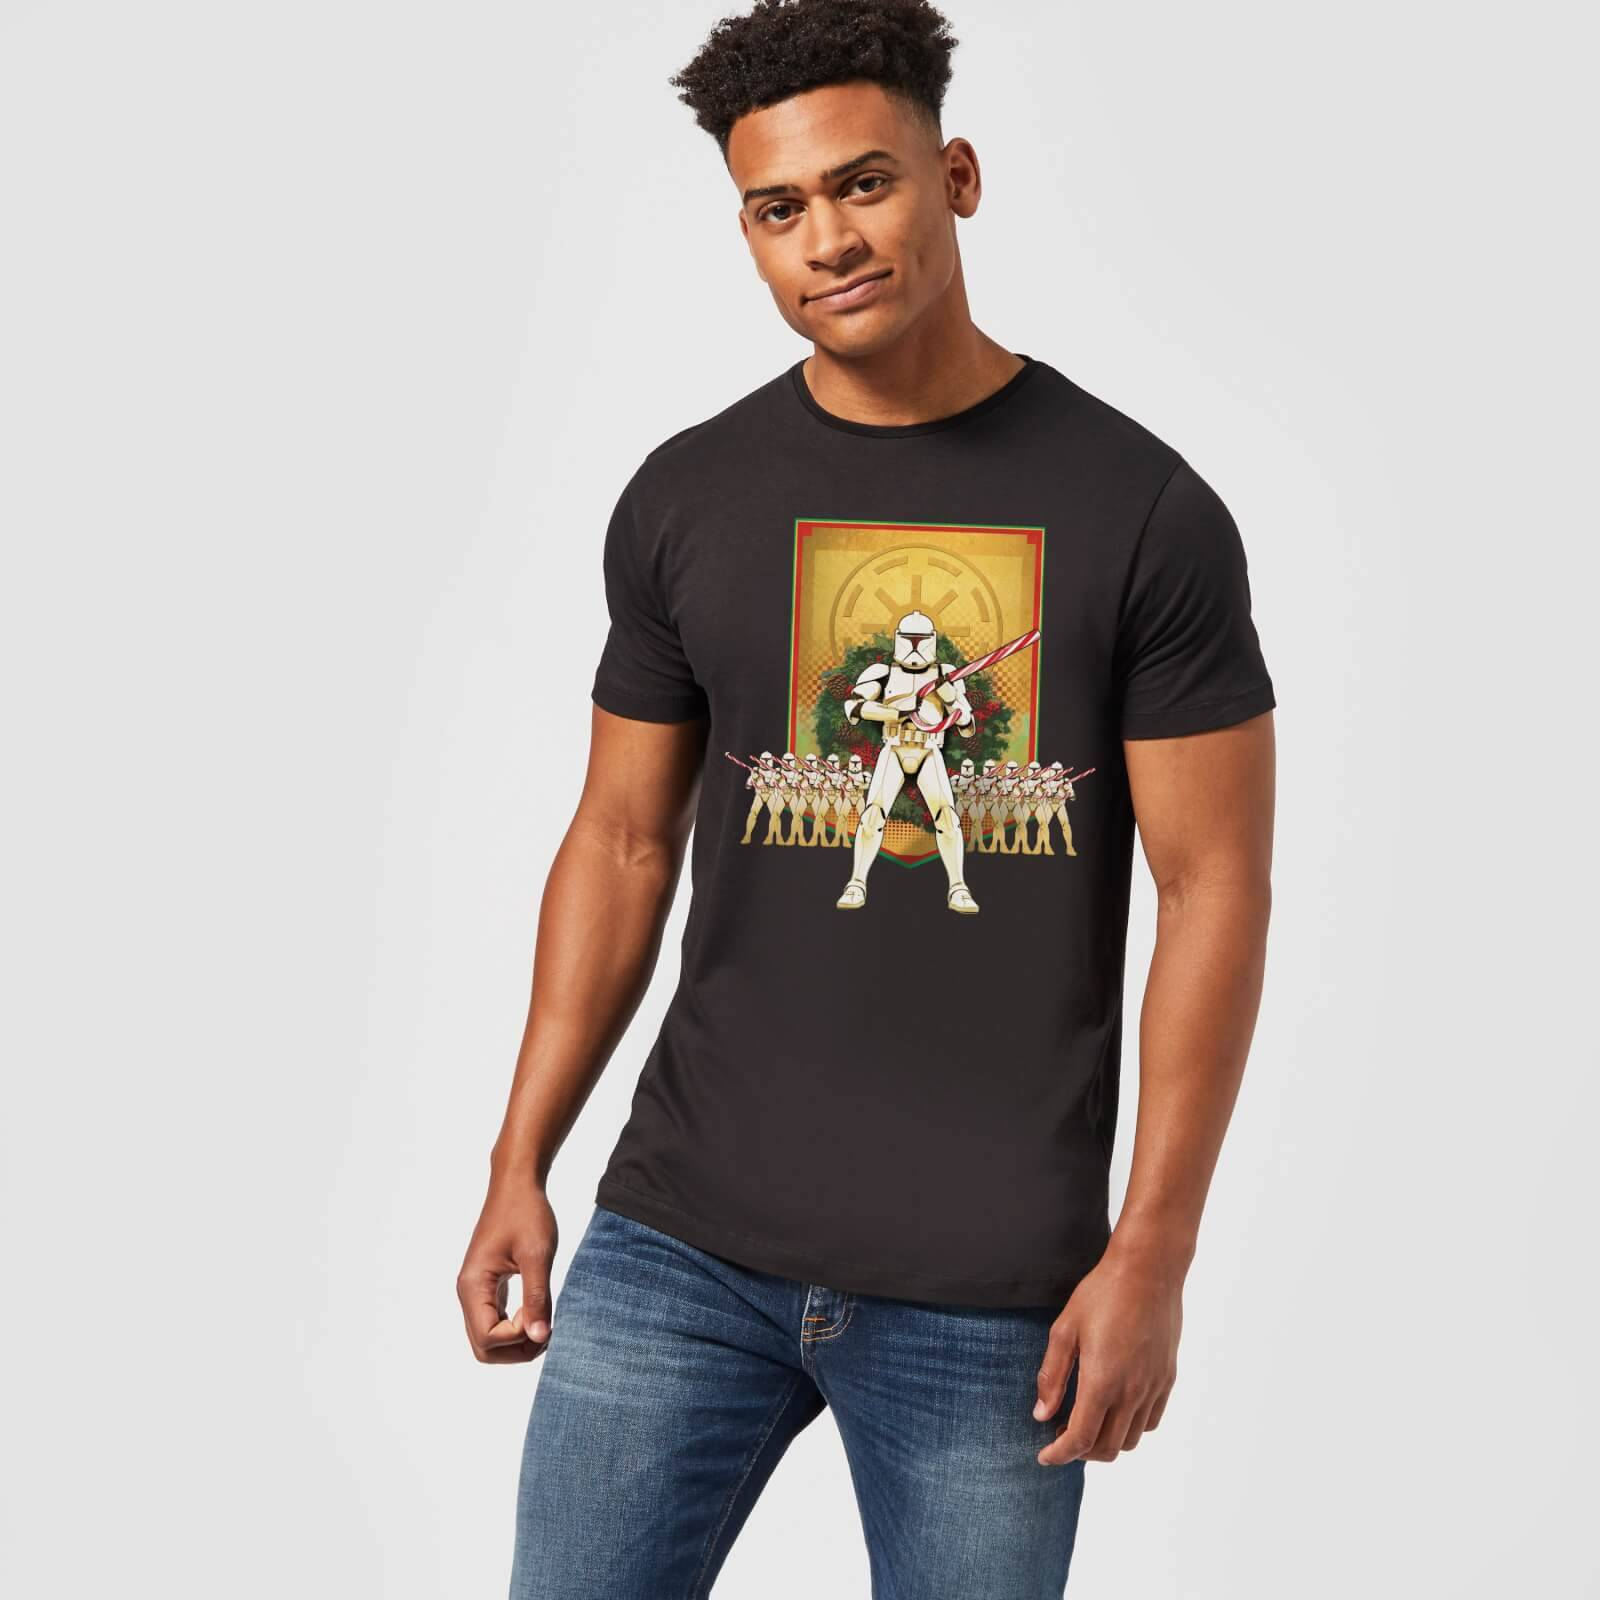 Star Wars T-Shirt Homme Chants Jedi Star Wars - Noir - XL - Noir